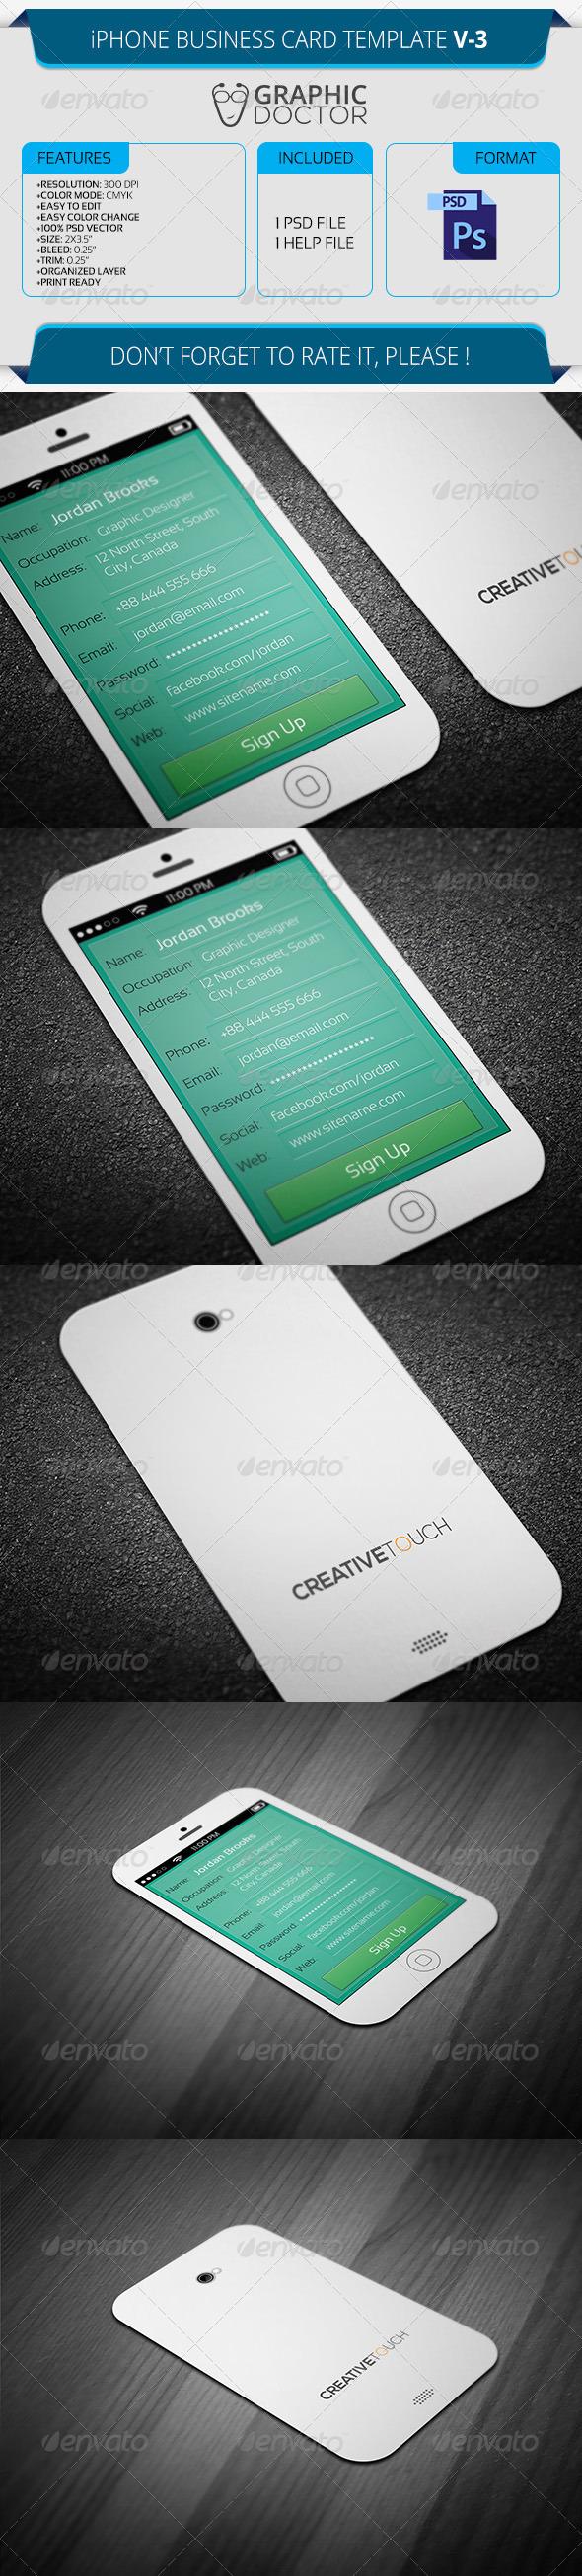 free dark iphone style business card template titanui